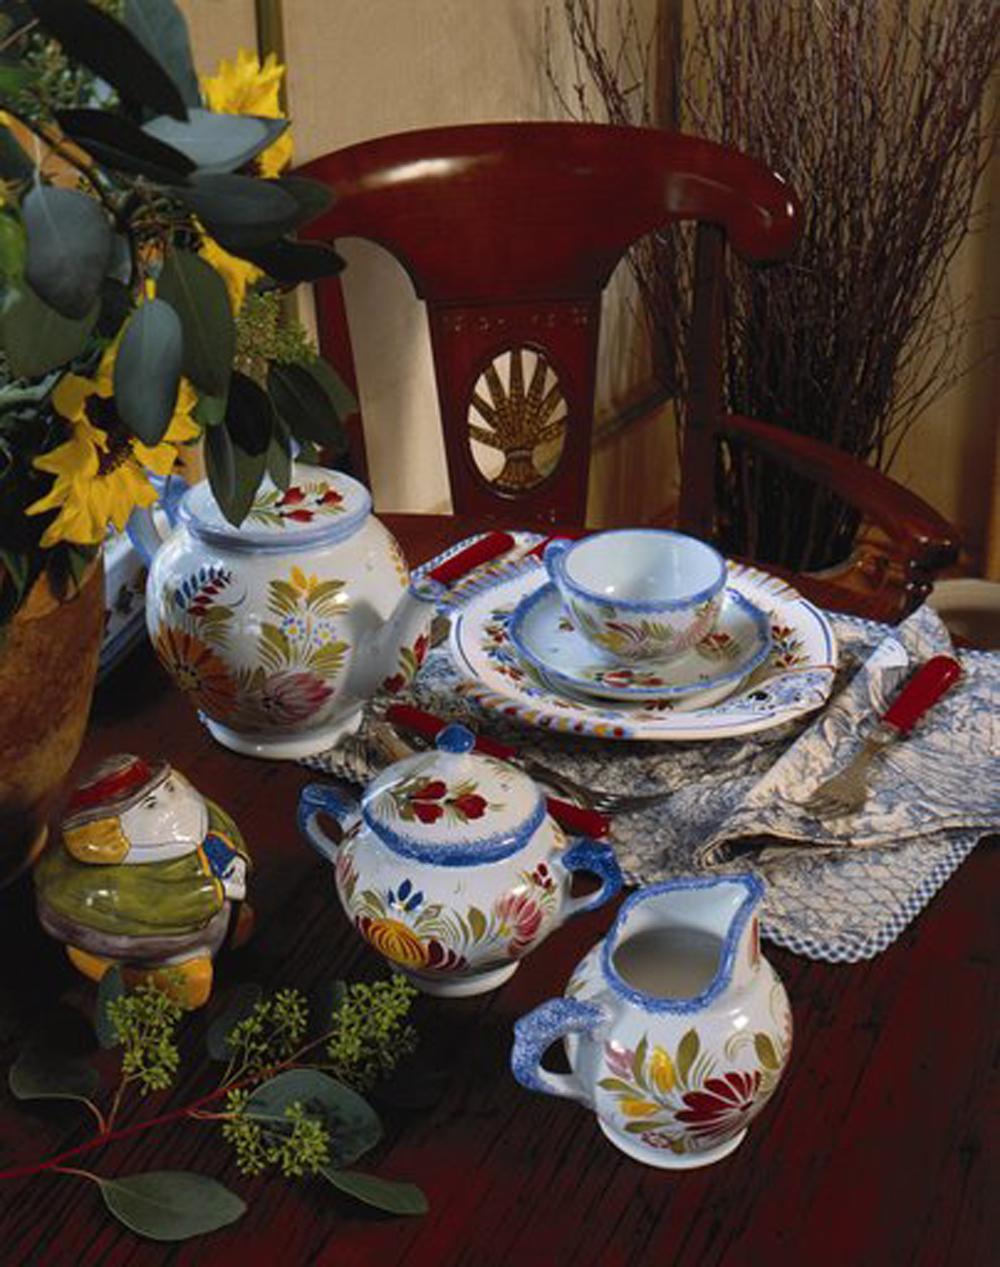 Home life interior design by rose ann humphrey